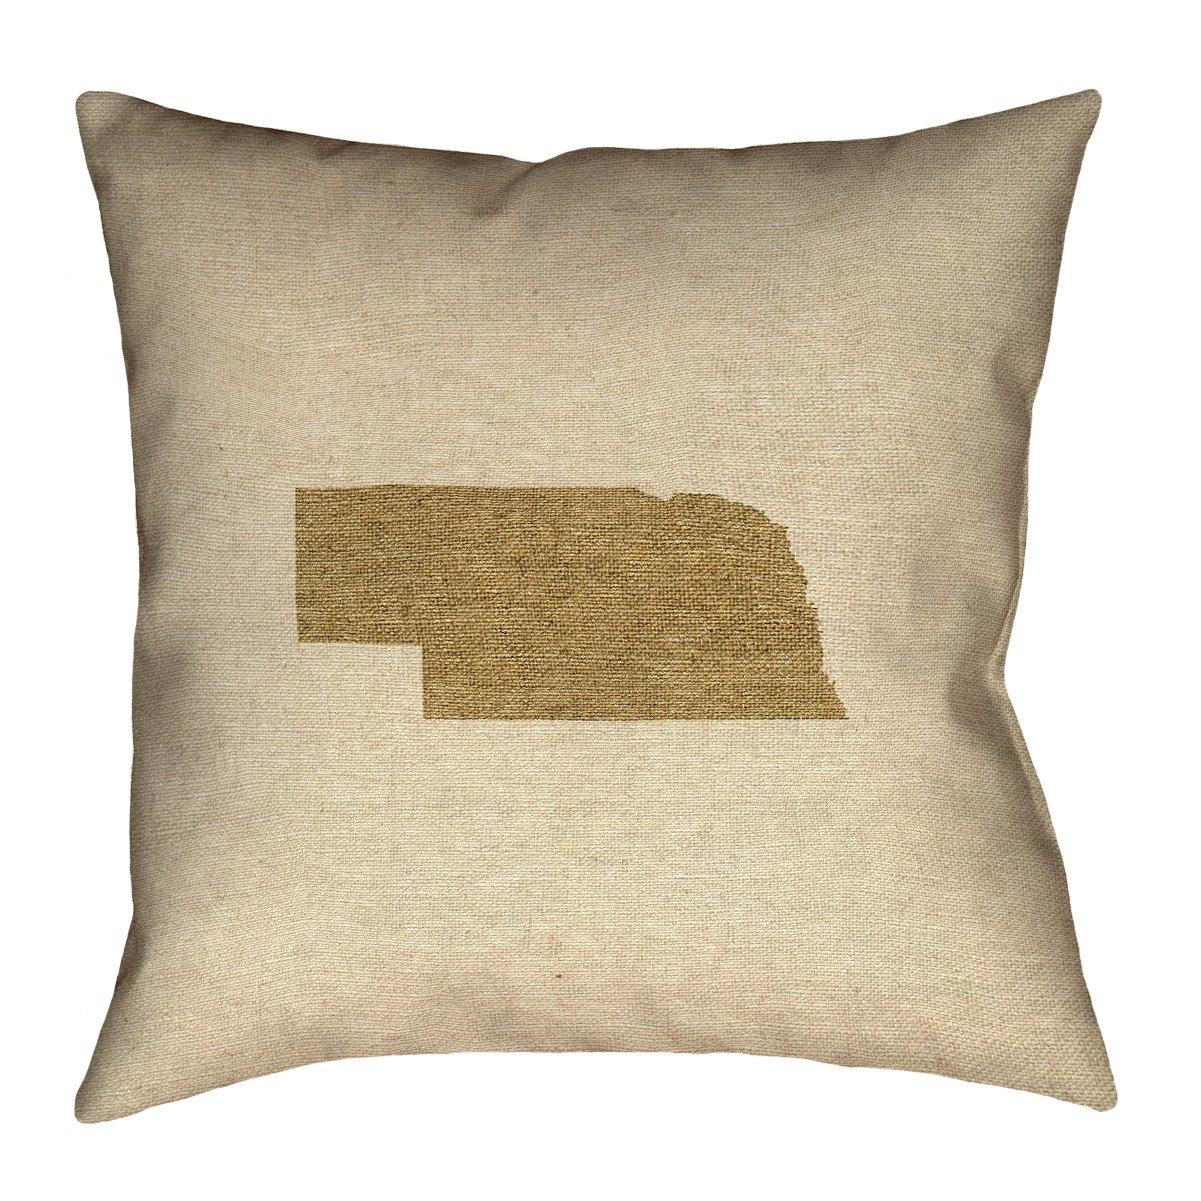 ArtVerse Katelyn Smith 36インチ x 36インチ フロア 両面プリント 隠しファスナーとネブラスカ キャンバス枕 B077H2C742